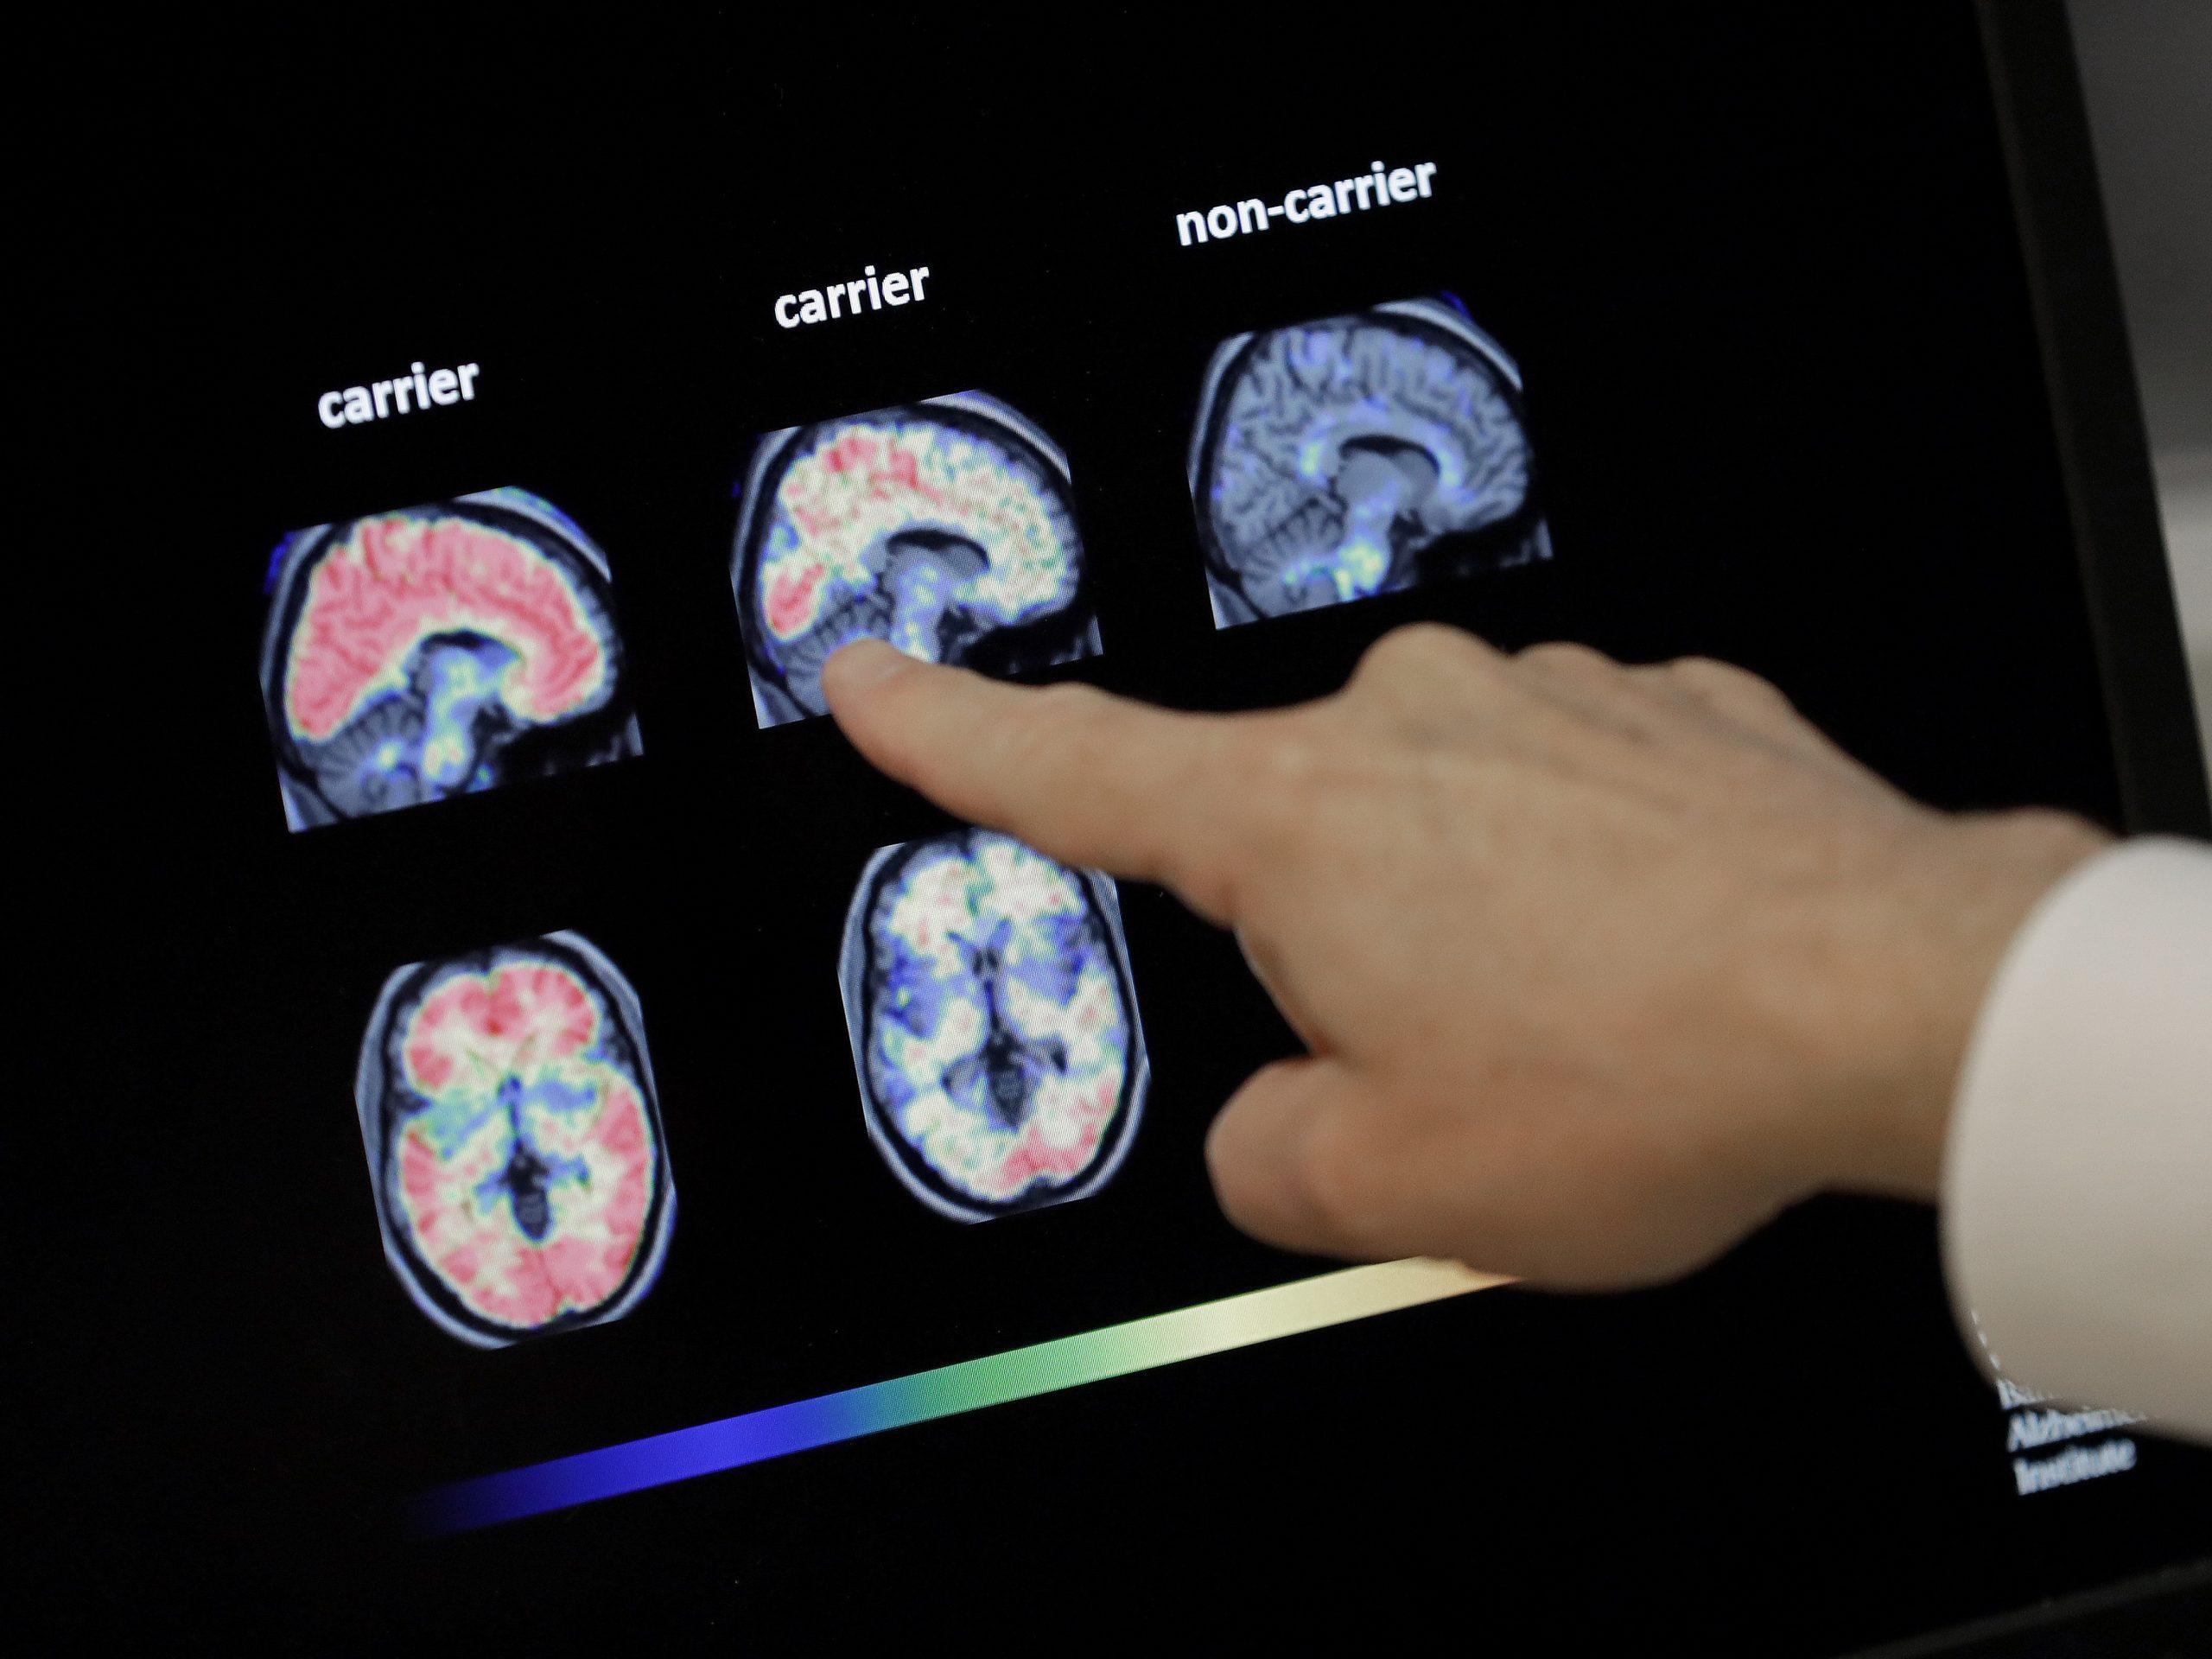 FDA Grants Accelerated Approval for Alzheimer's Drug